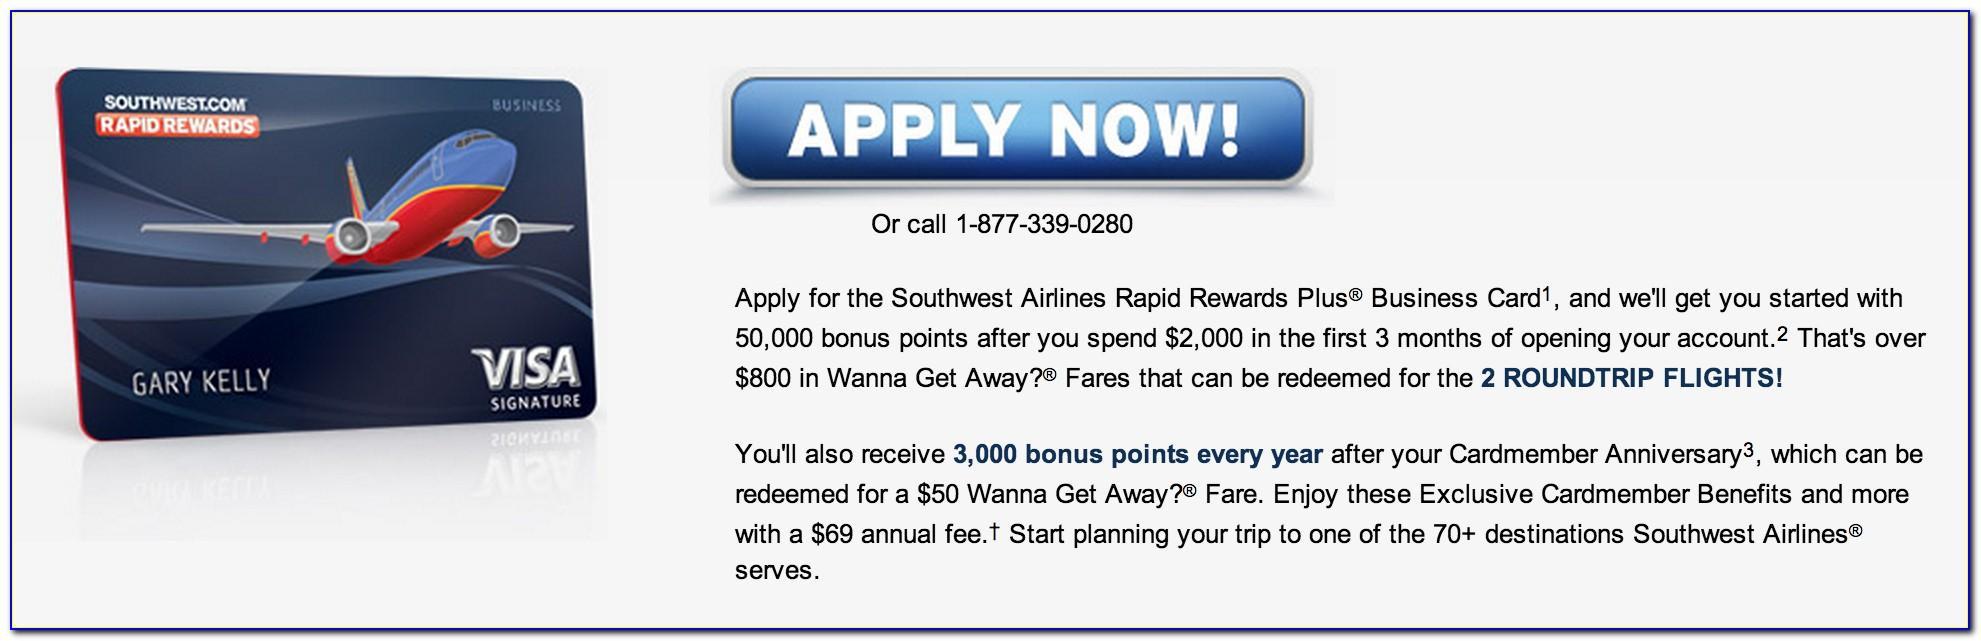 Southwest Business Card Application Status